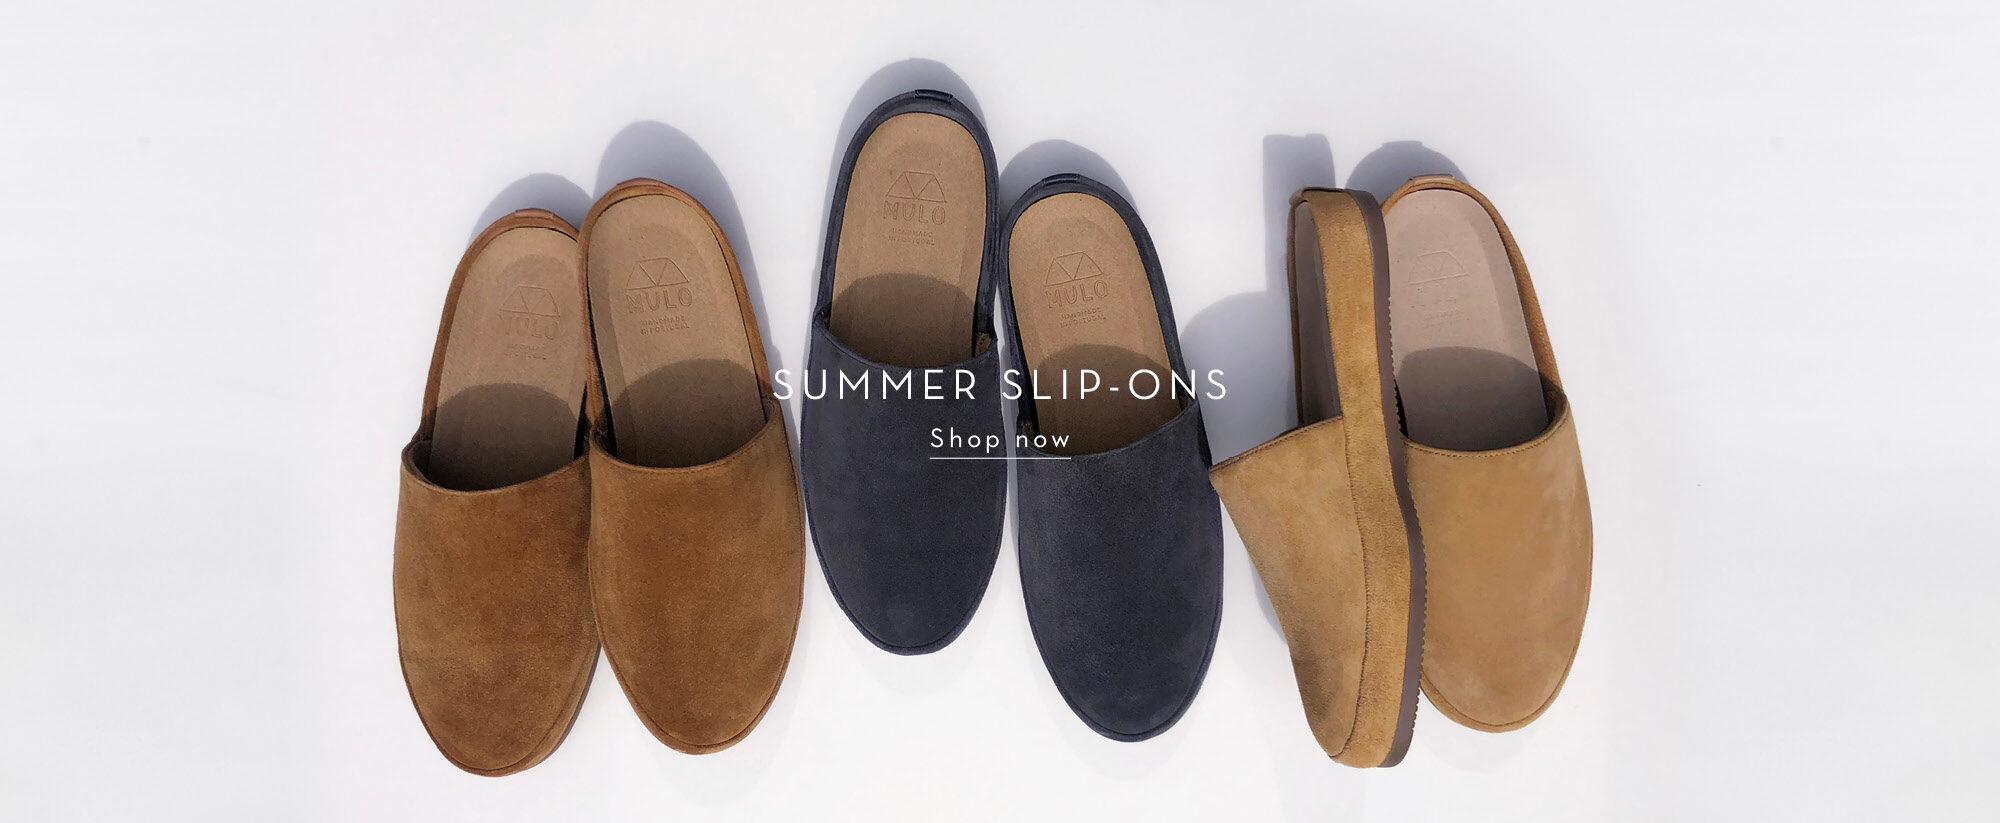 Travel Essentials - Summer Shoes for Men